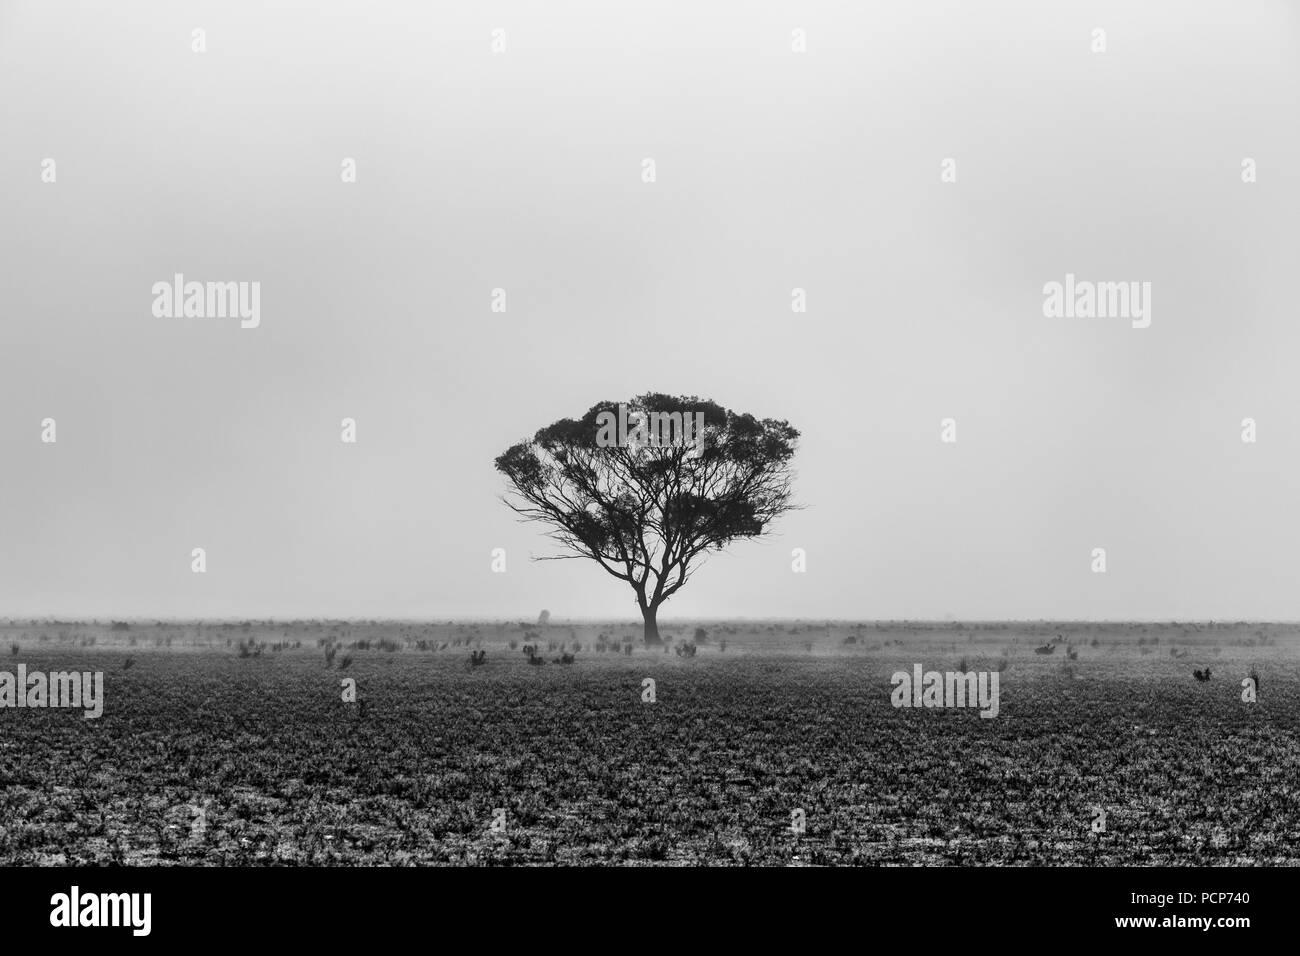 Lone tree in desert landscape in the morning fog - Stock Image